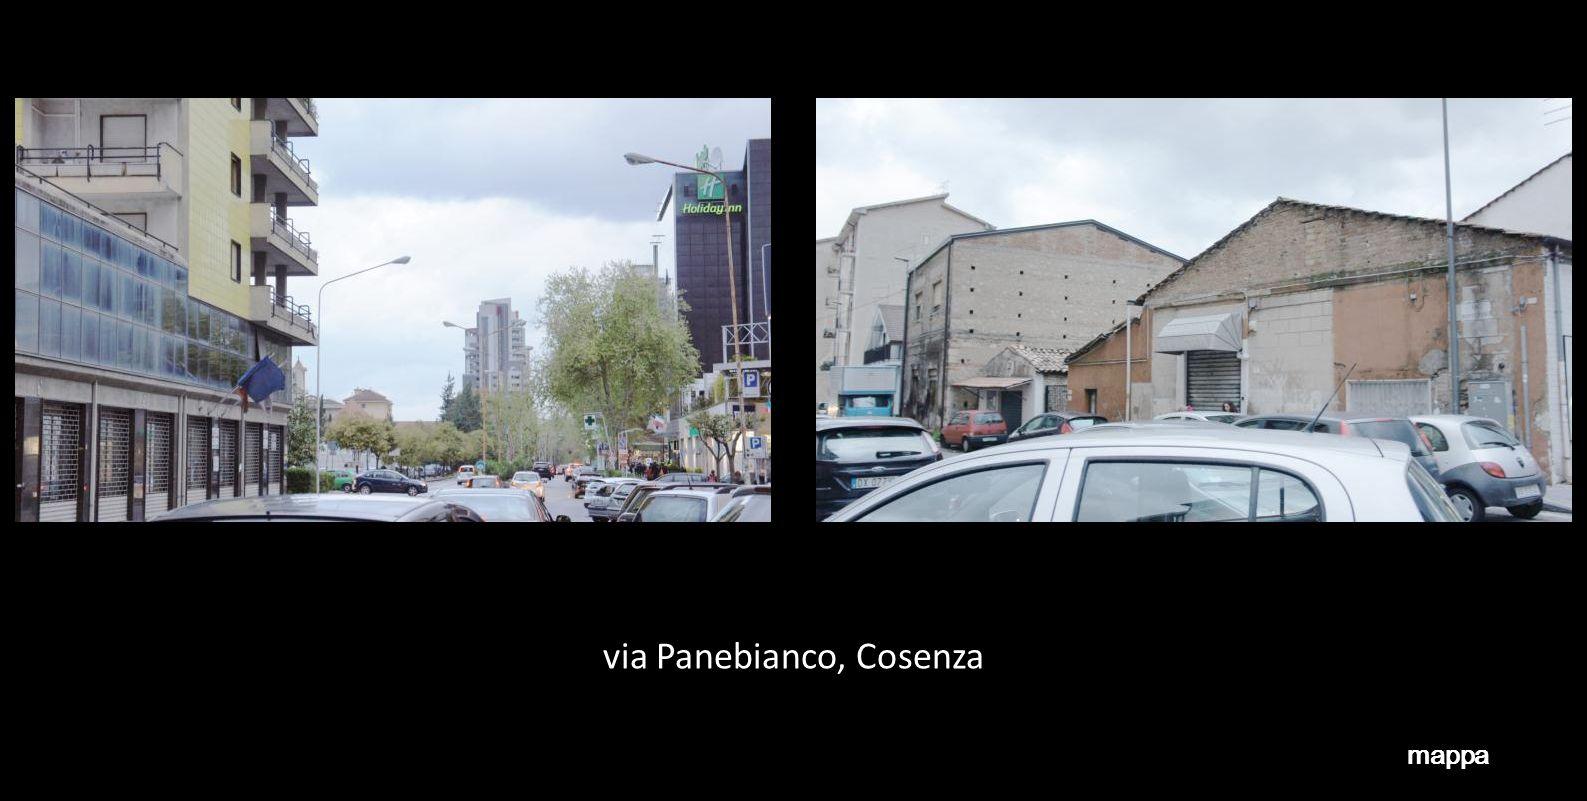 via Panebianco, Cosenza mappa